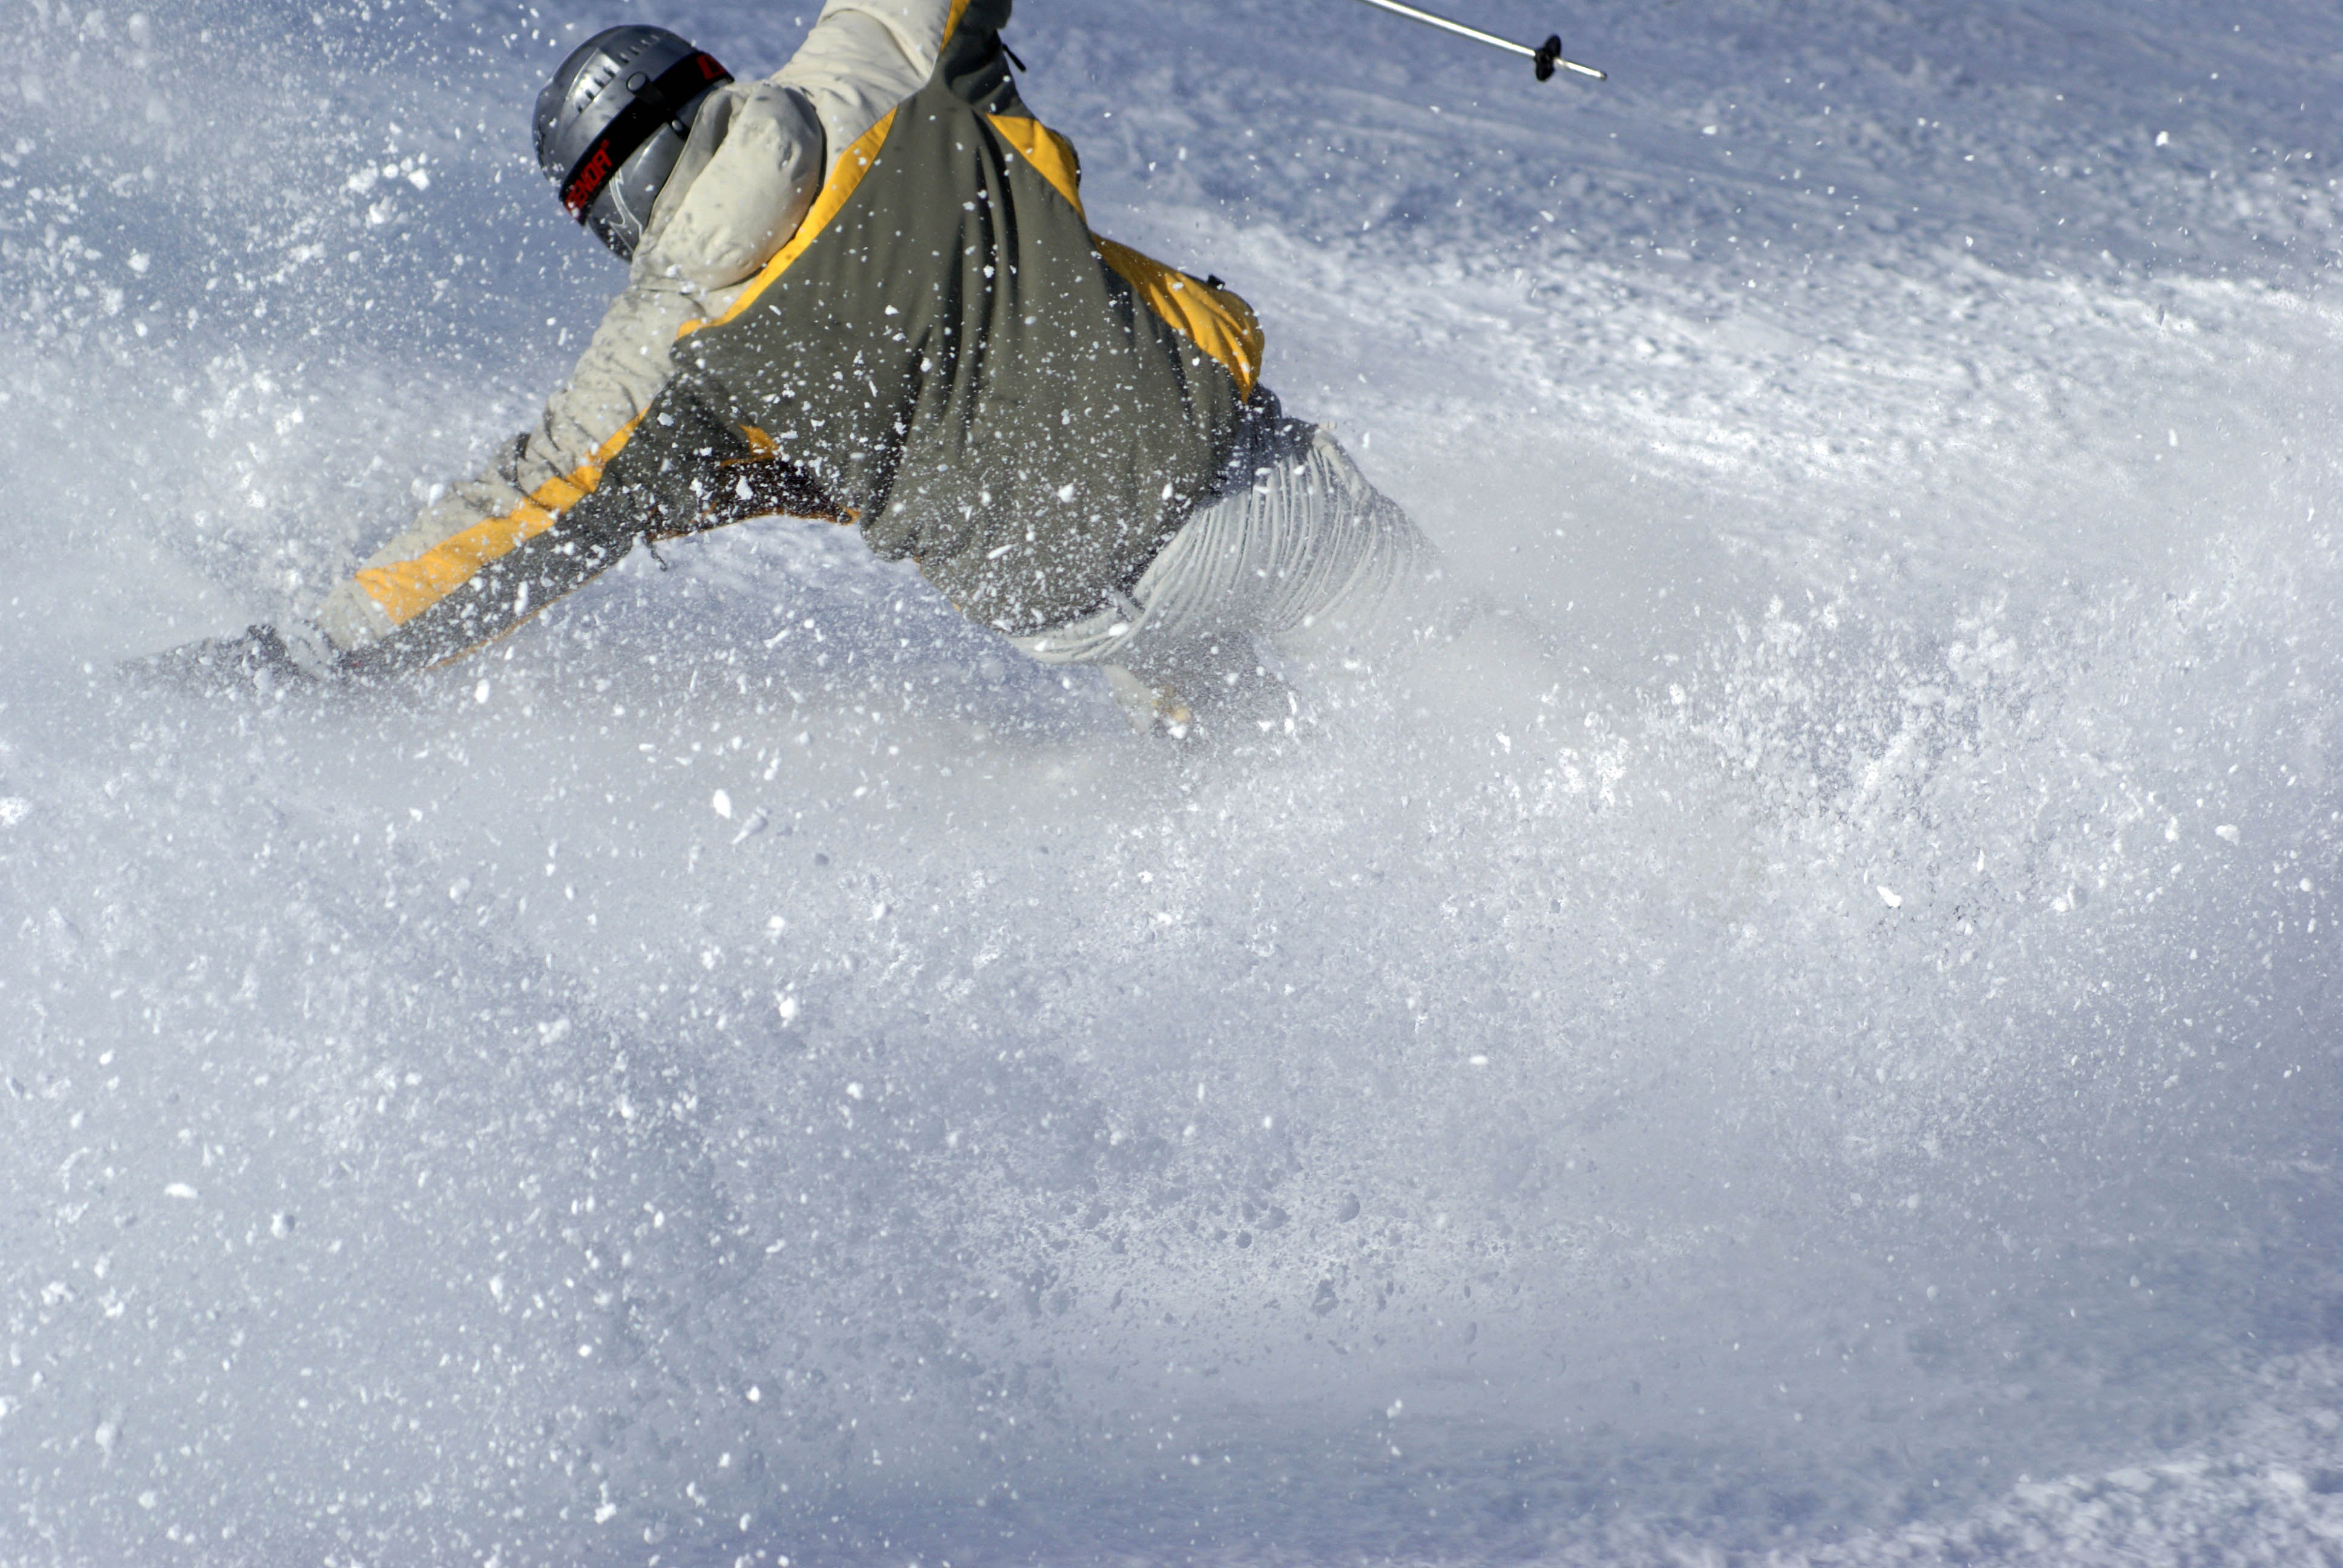 OC wywrotka na nartach